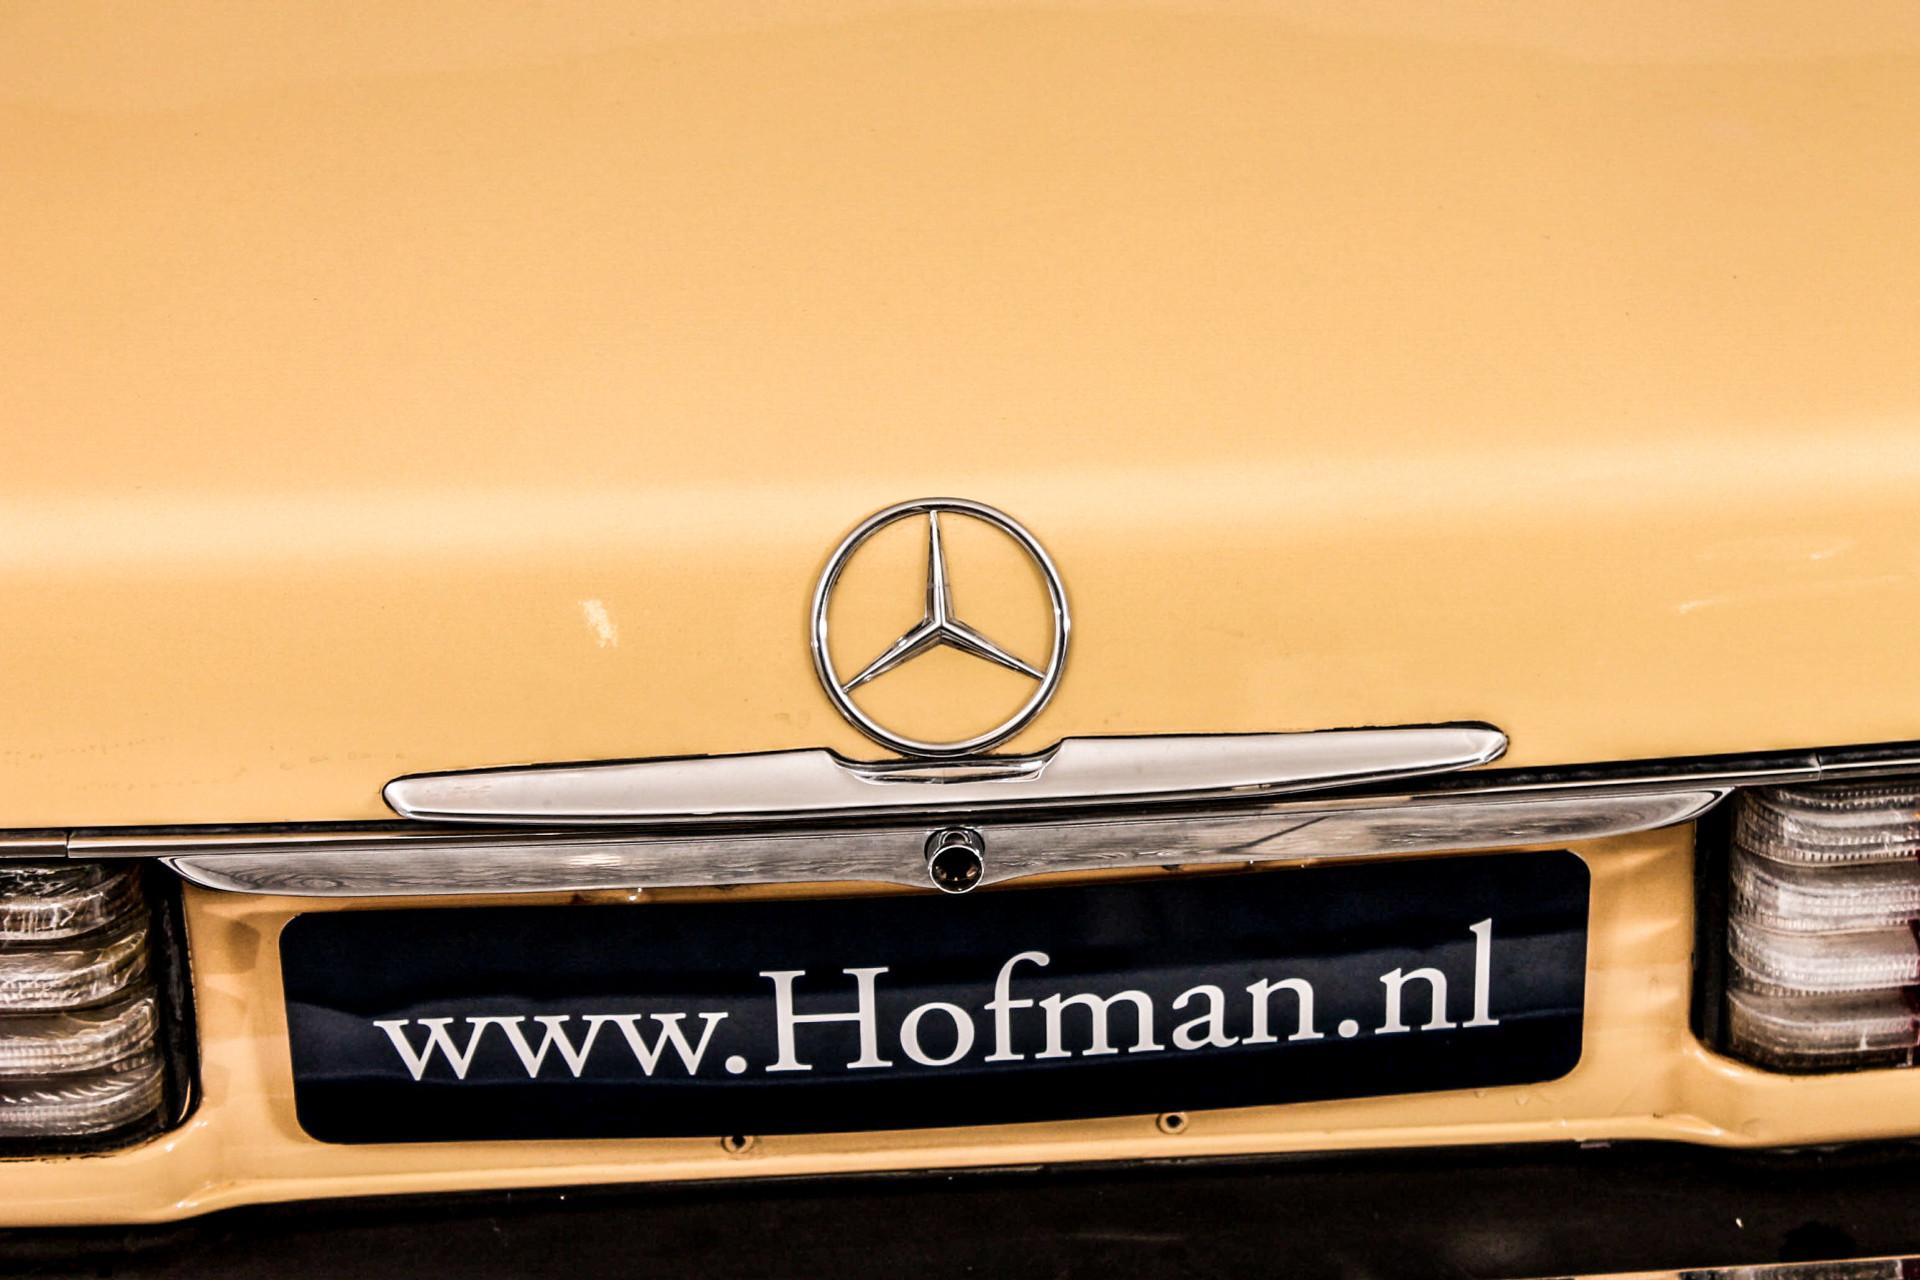 Mercedes-Benz SL-Klasse Roadster 380 SL Foto 4